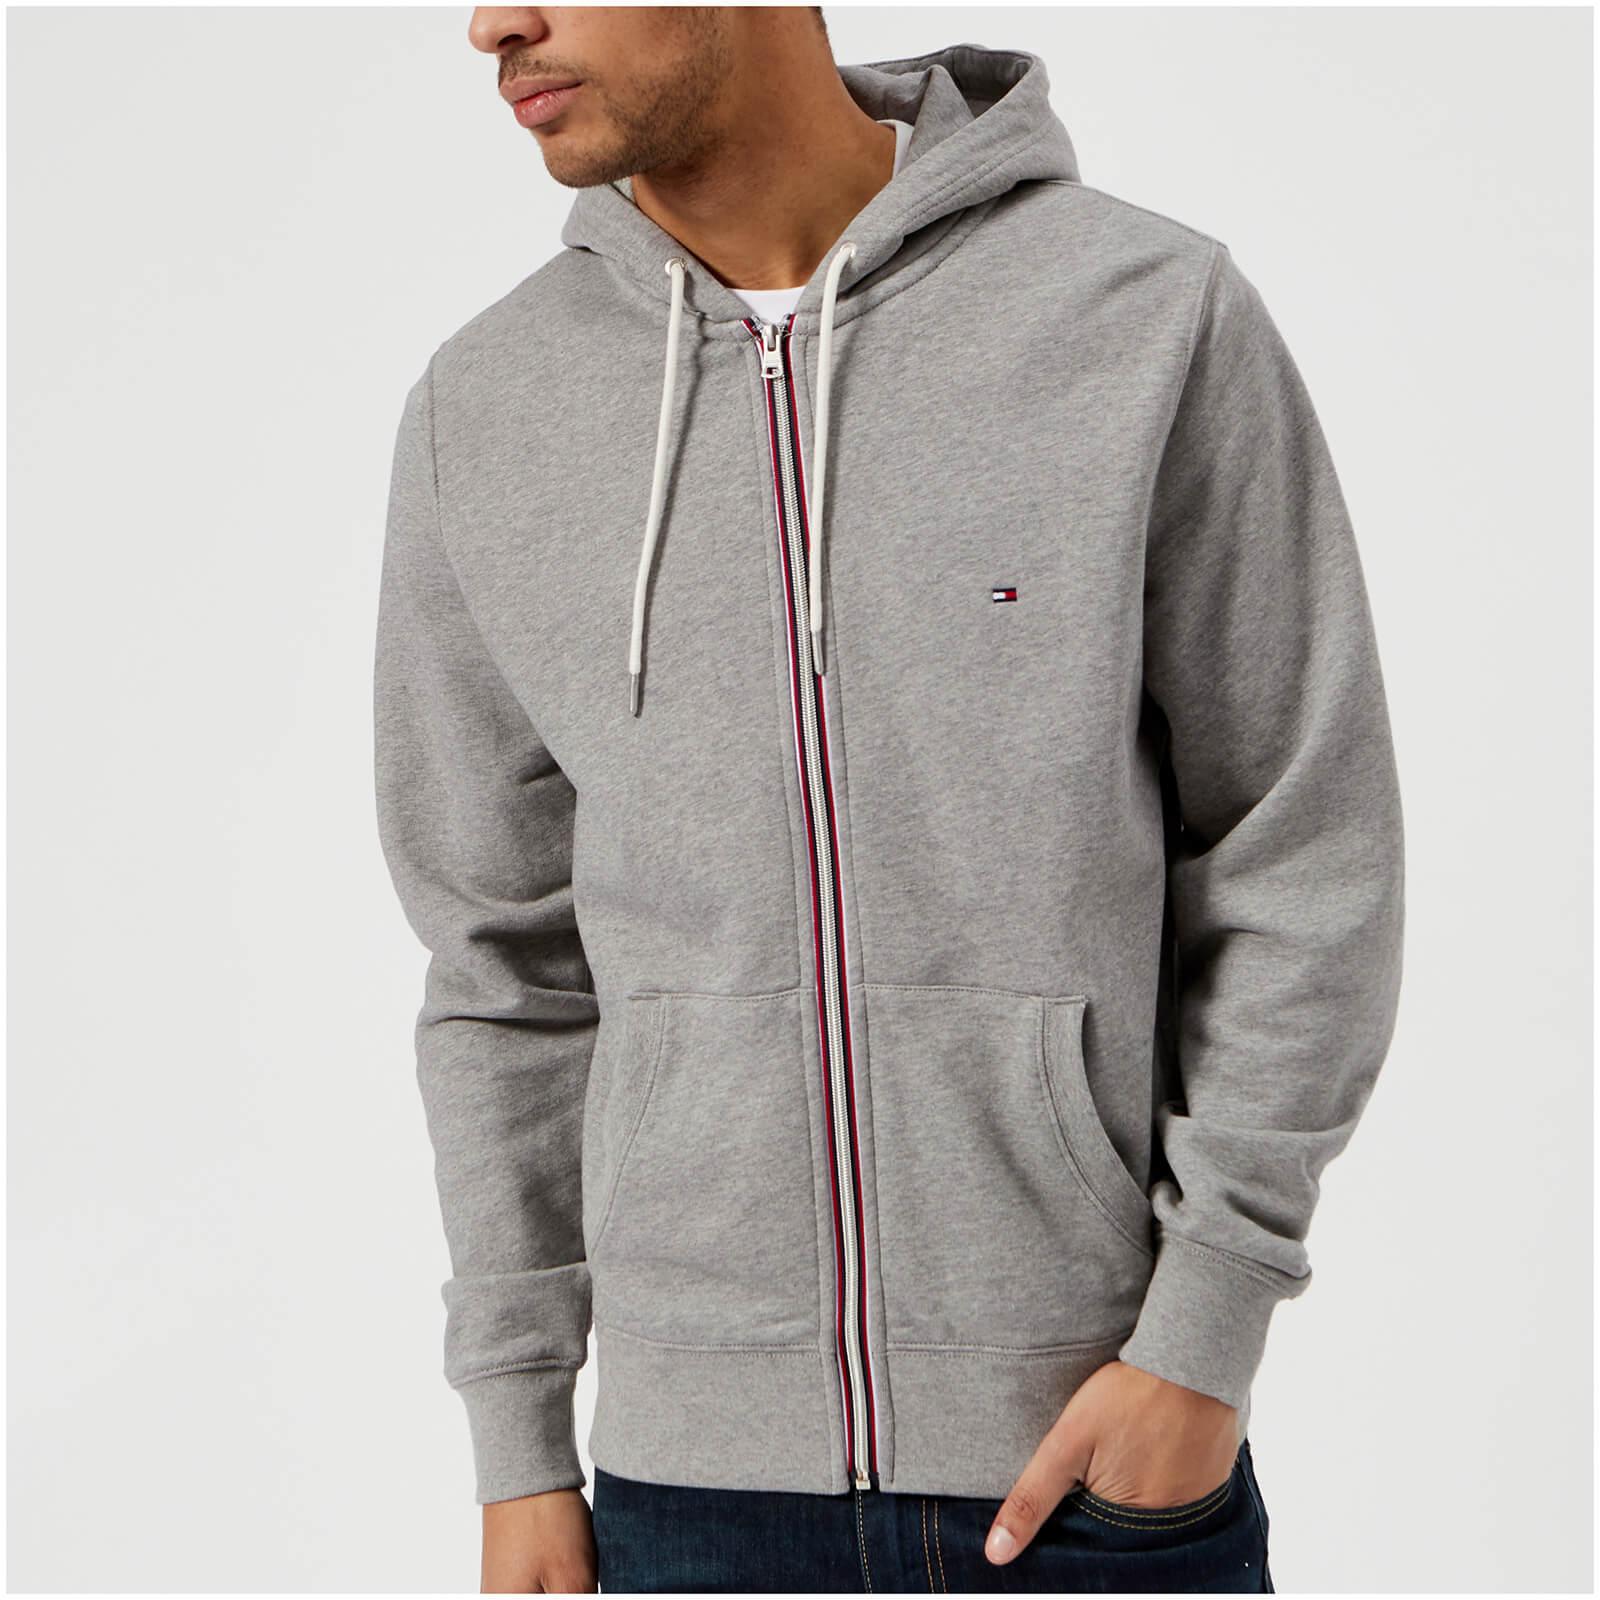 a5c22d17 Tommy Hilfiger Men's Basic Hooded Zip Through Sweatshirt - Cloud Heather  Mens Clothing | TheHut.com